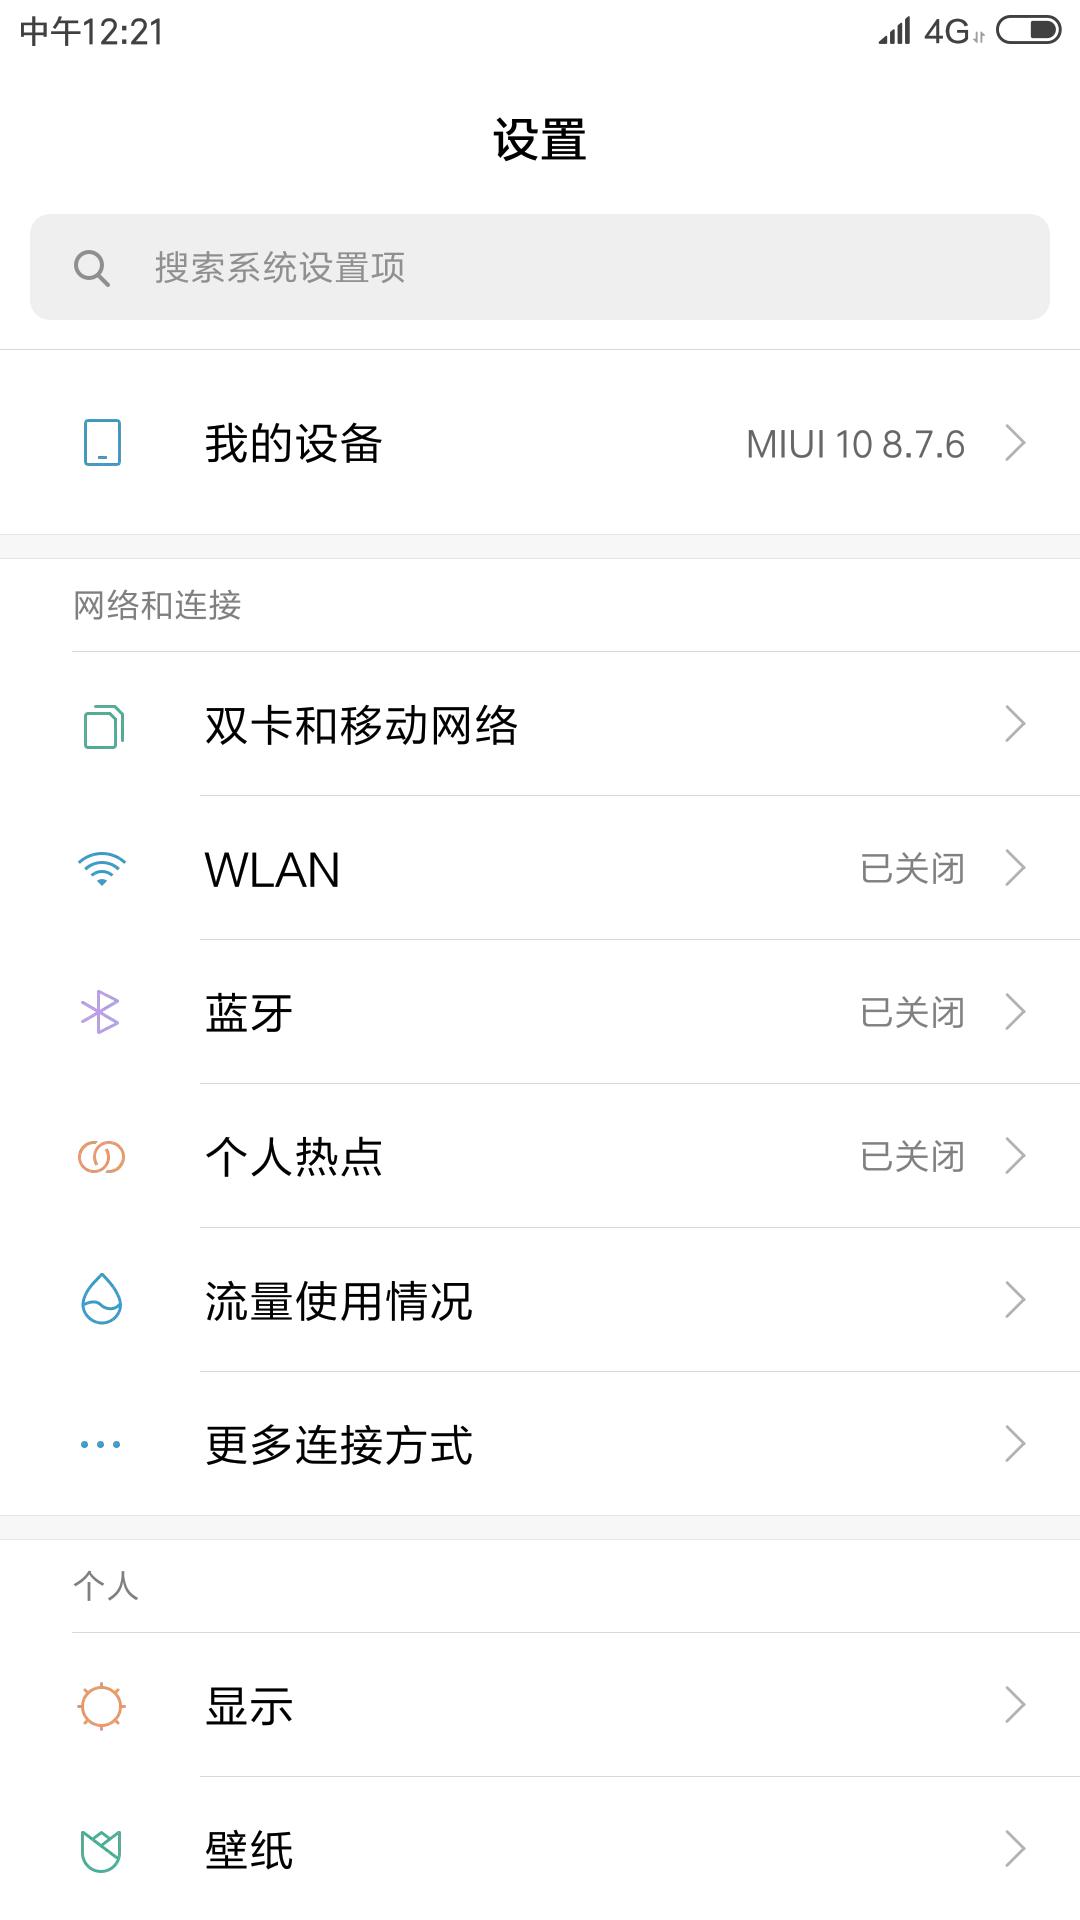 Screenshot_2018-07-06-12-21-28-037_com.android.settings.png